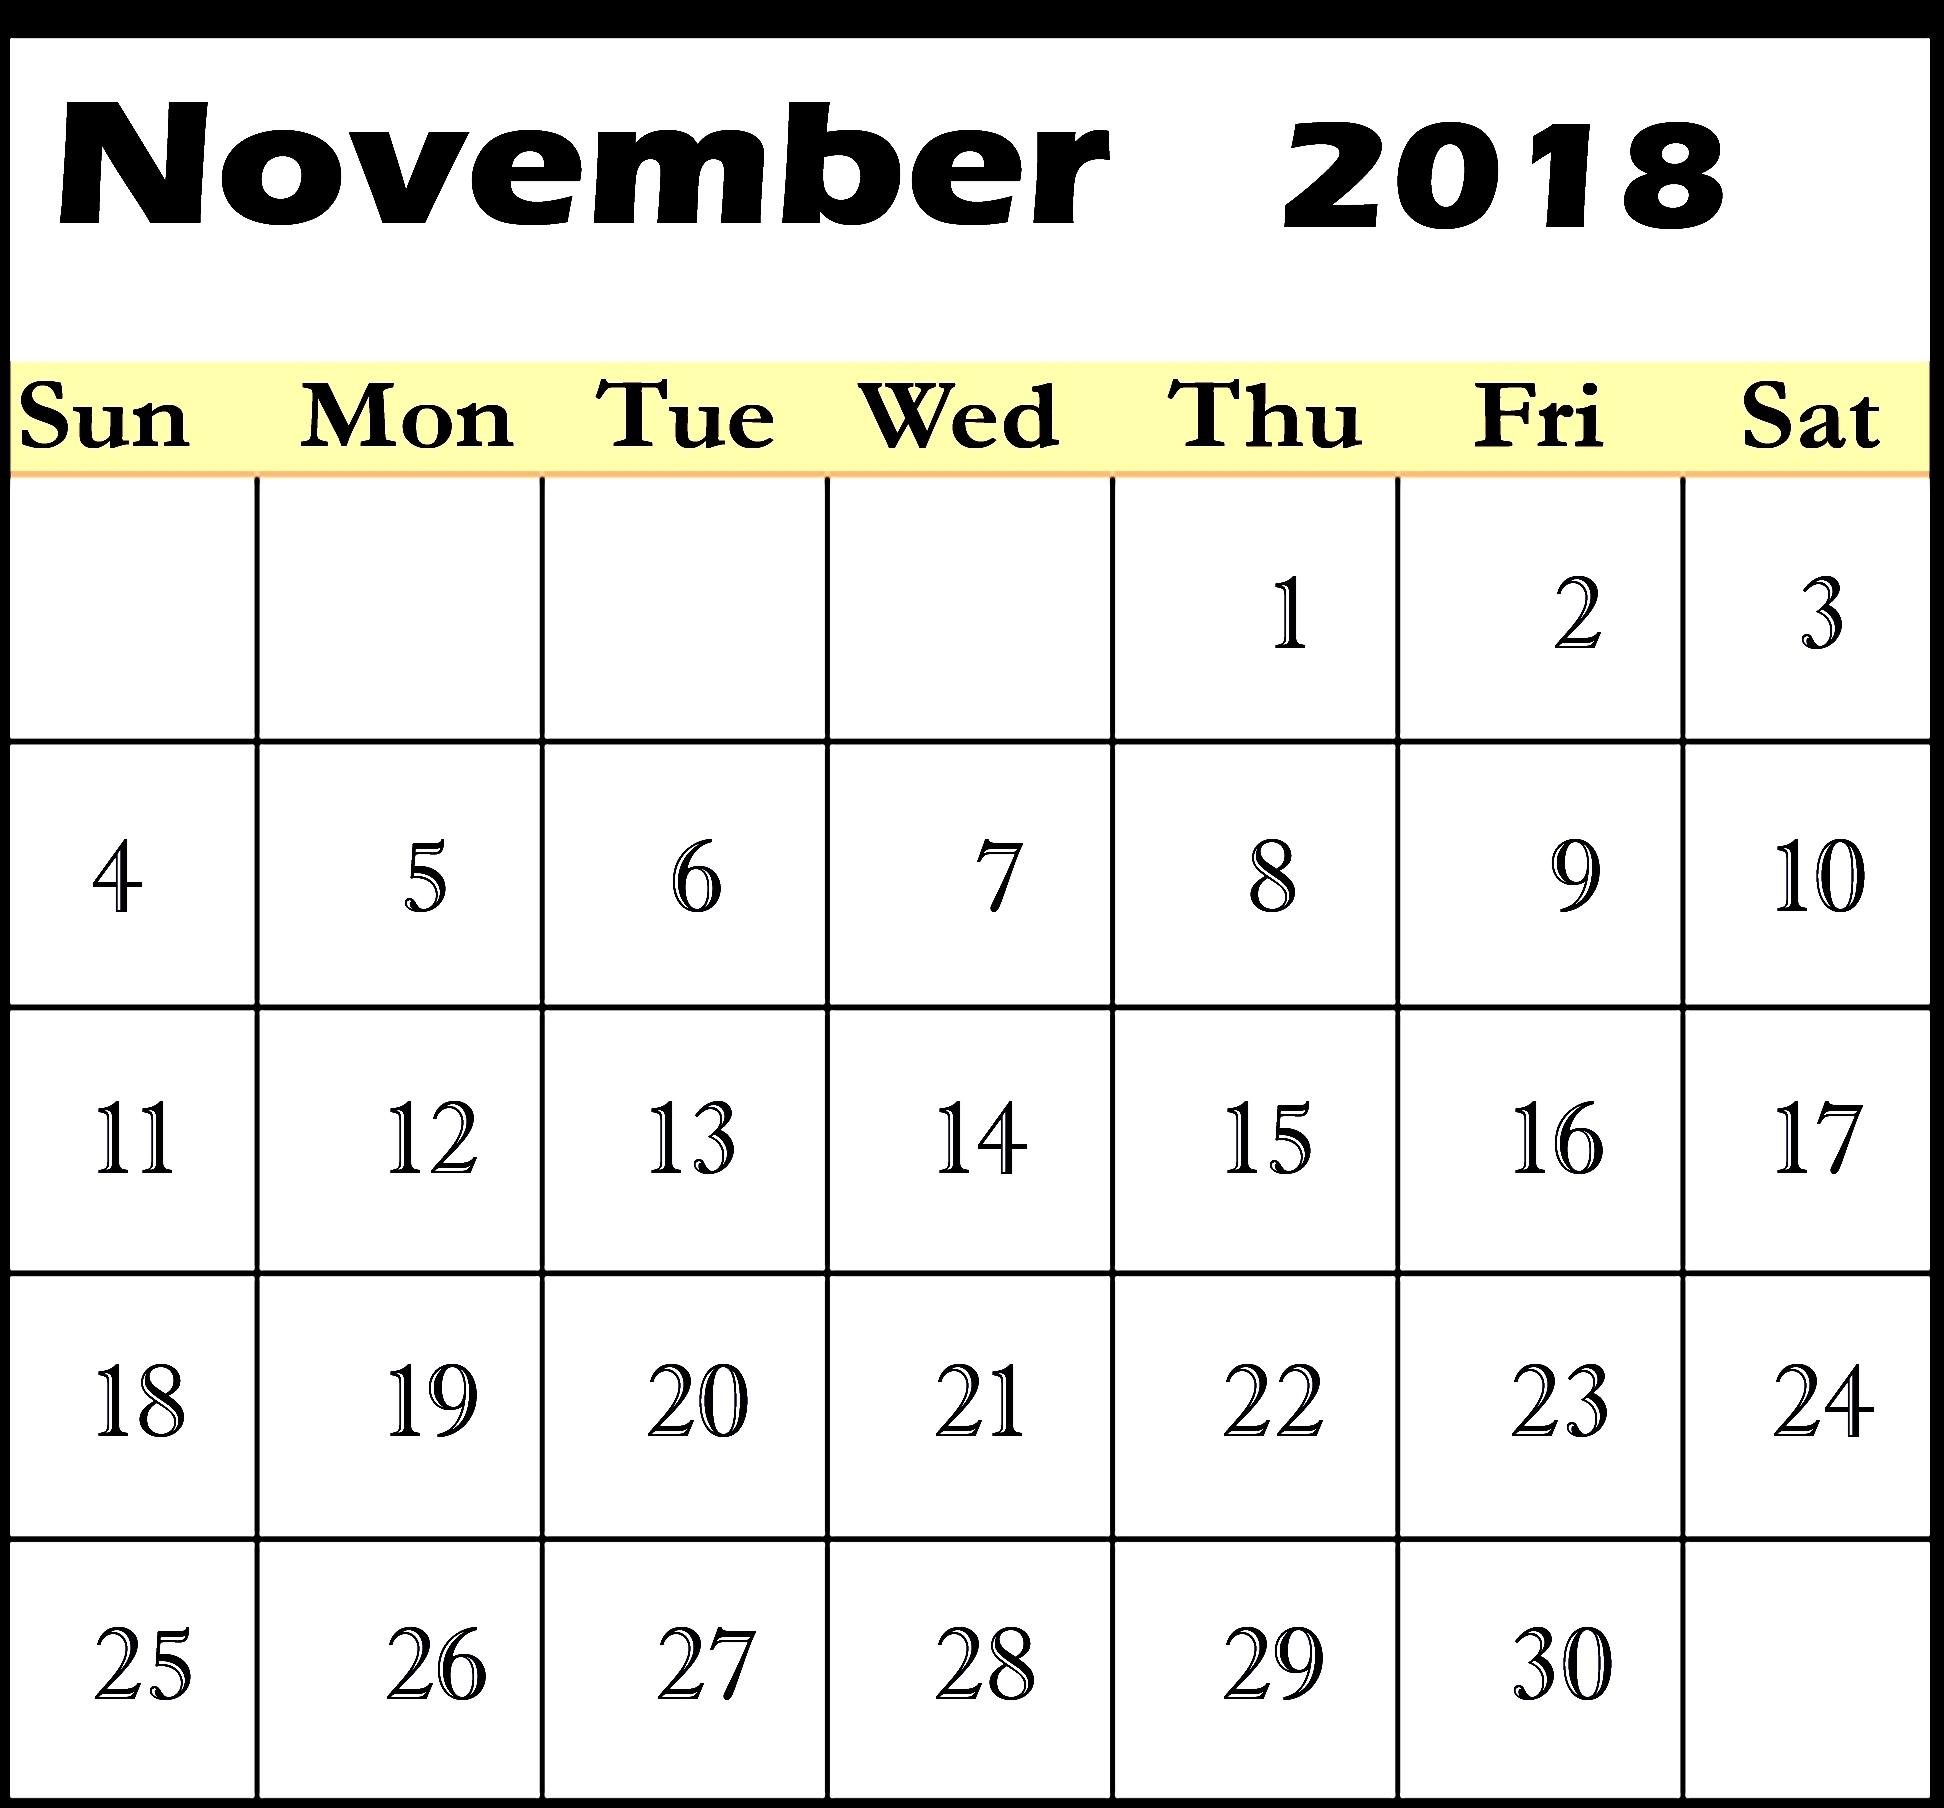 blank november 2018 calendar calendar template letter format::November 2018 Calendar Printable